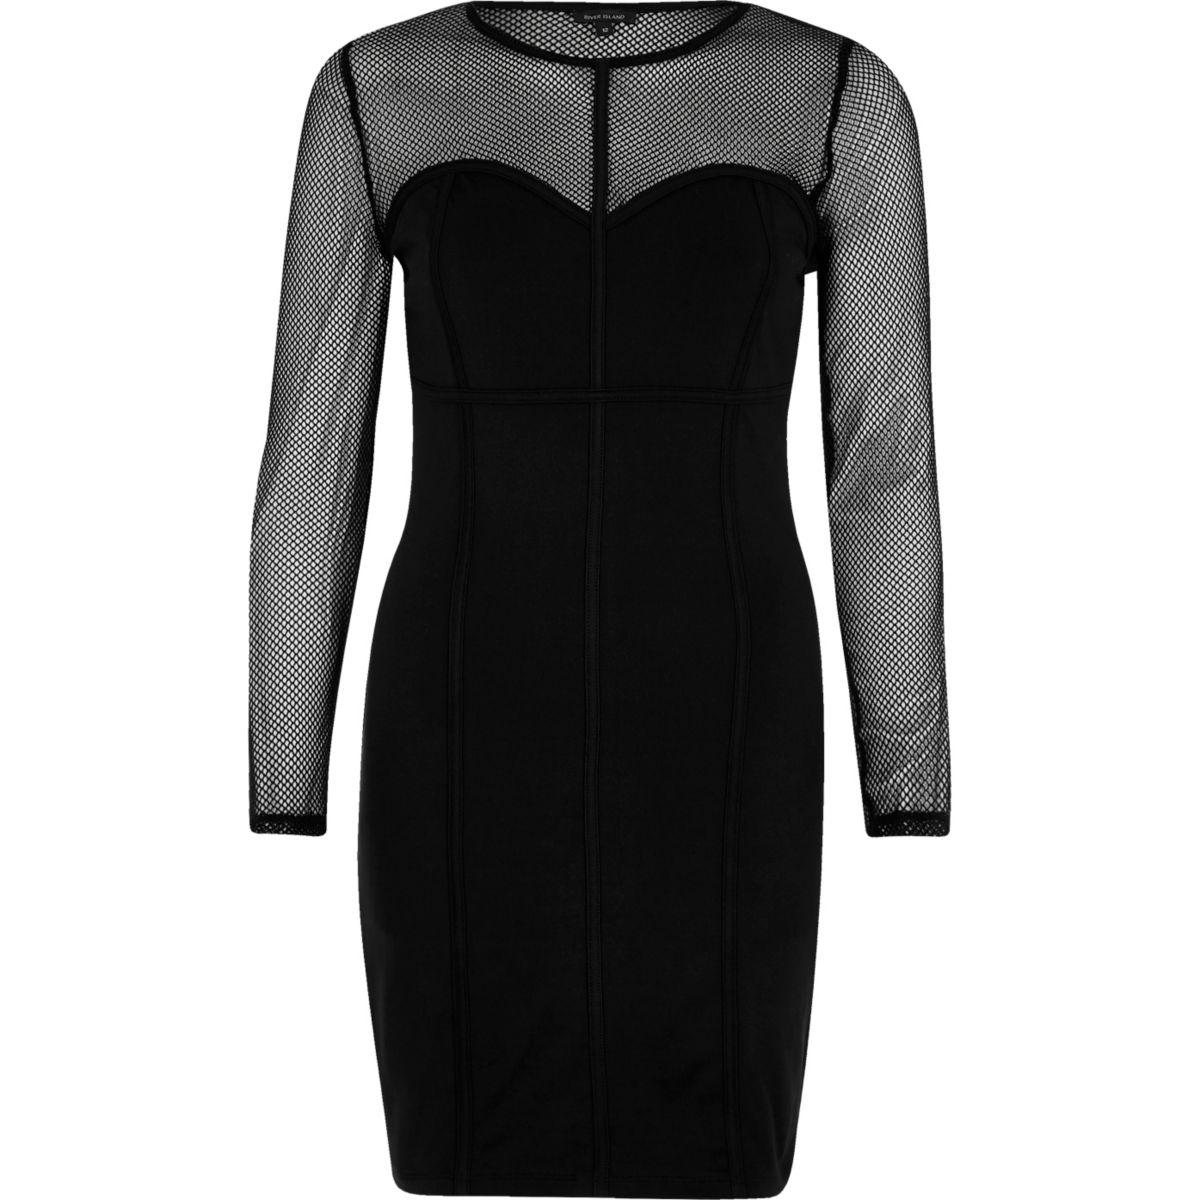 Black mesh corset seam bodycon dress